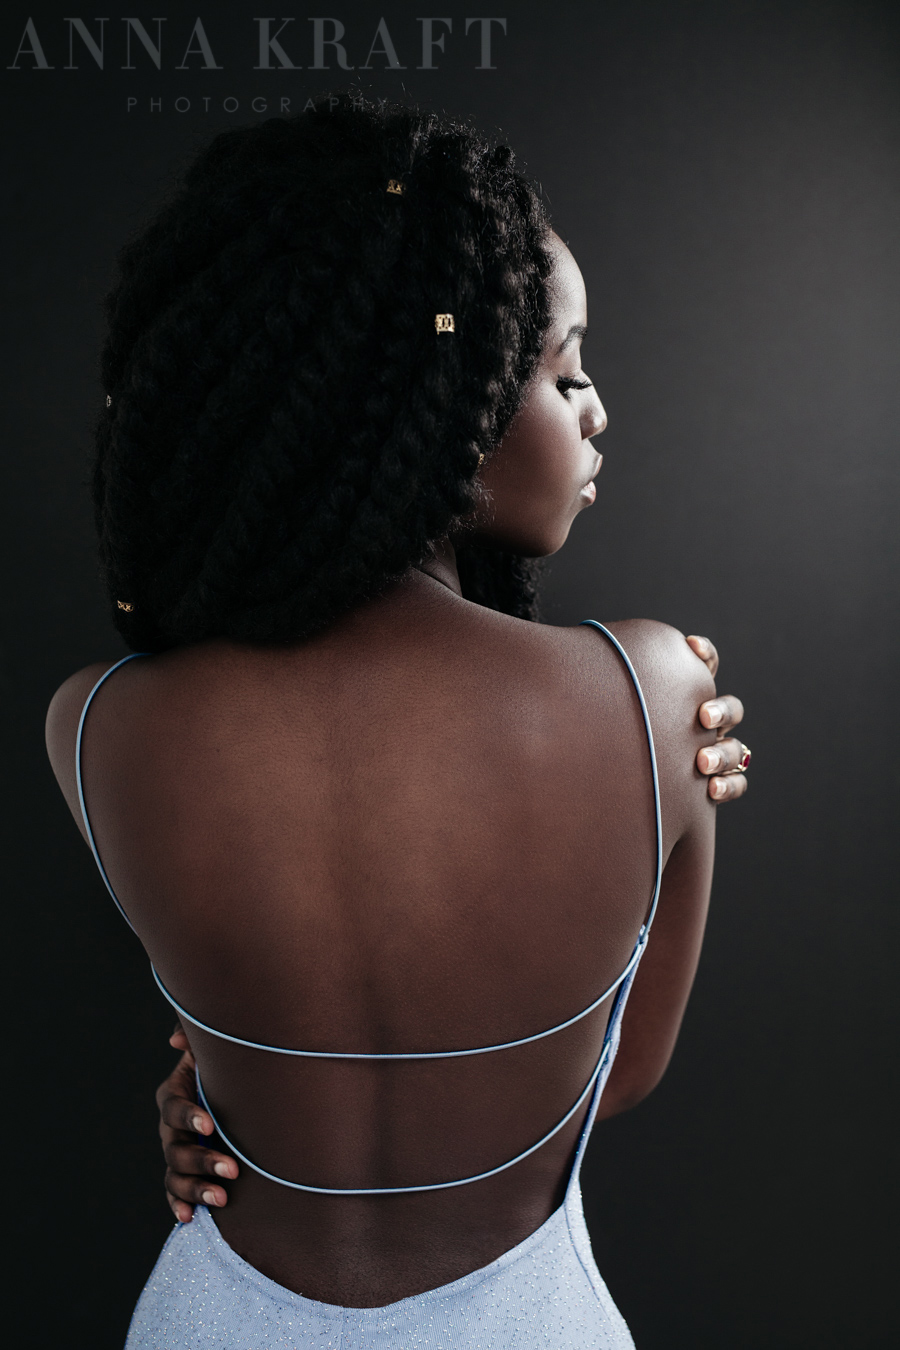 anna_kraft_photography_georgetown_jonathan_dade_davina_senior_portrait-11.jpg